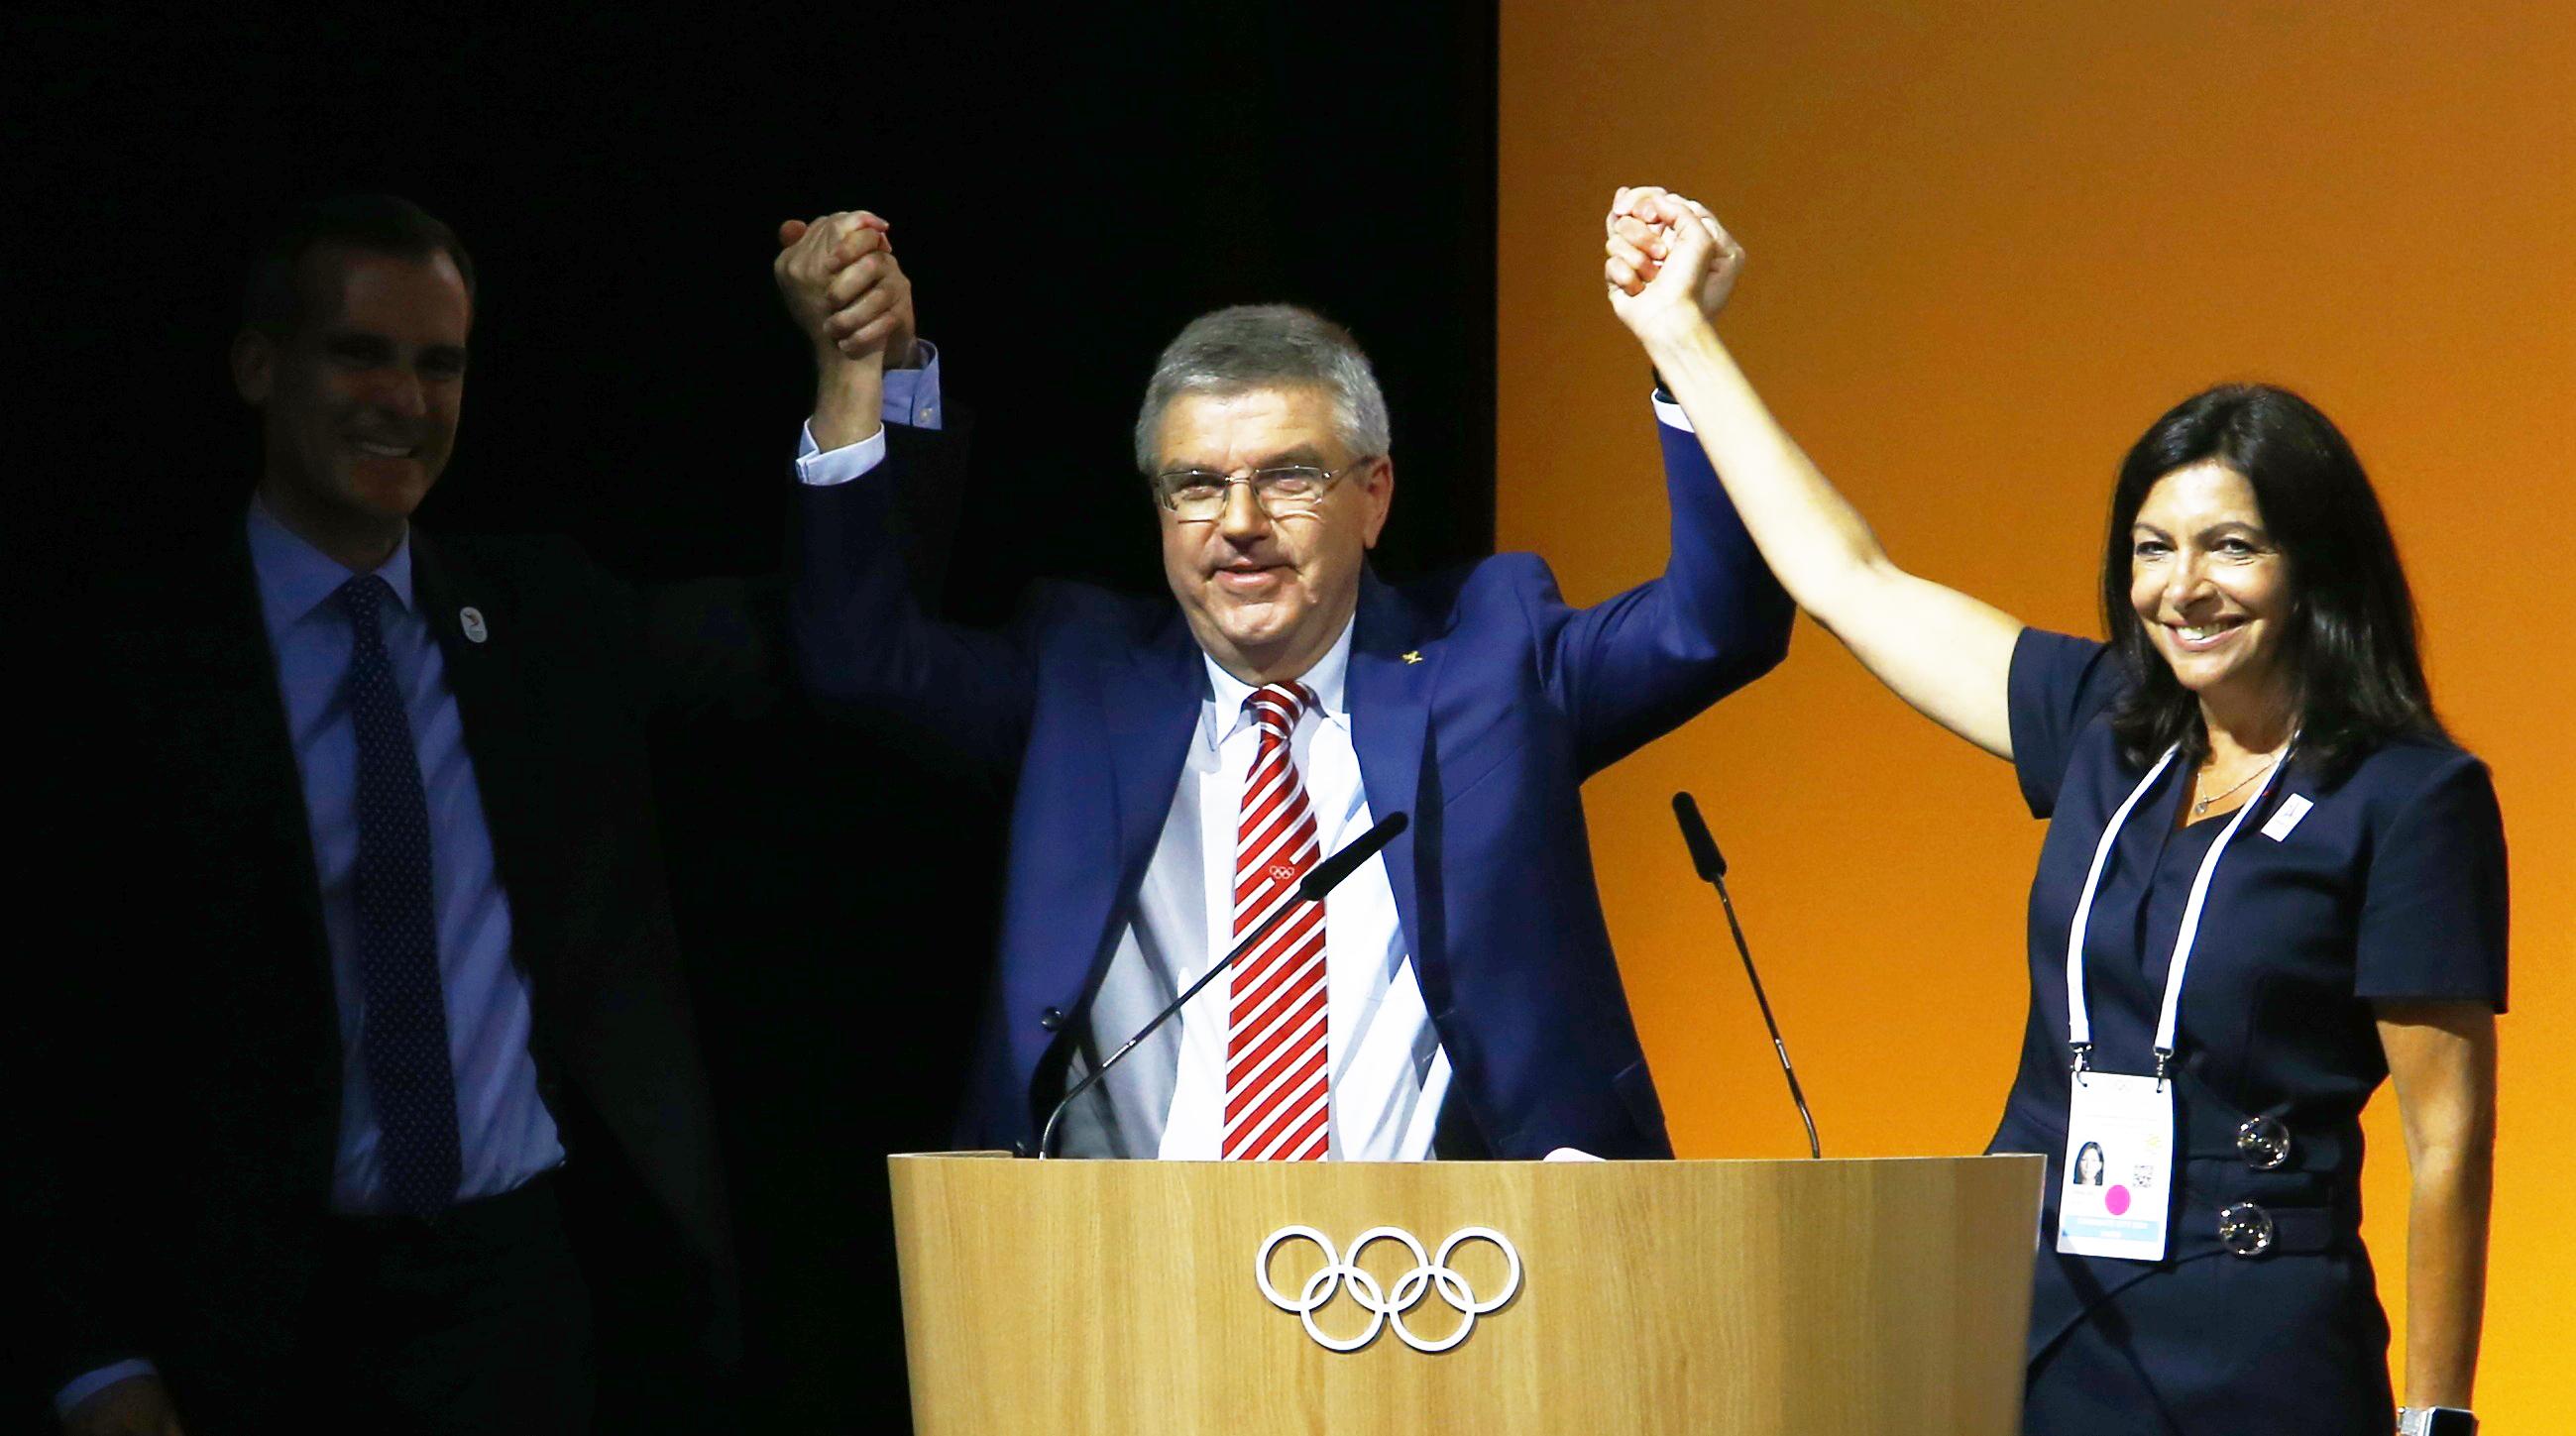 Olympics: IOC approves awarding both 2024, 2028 Games in September